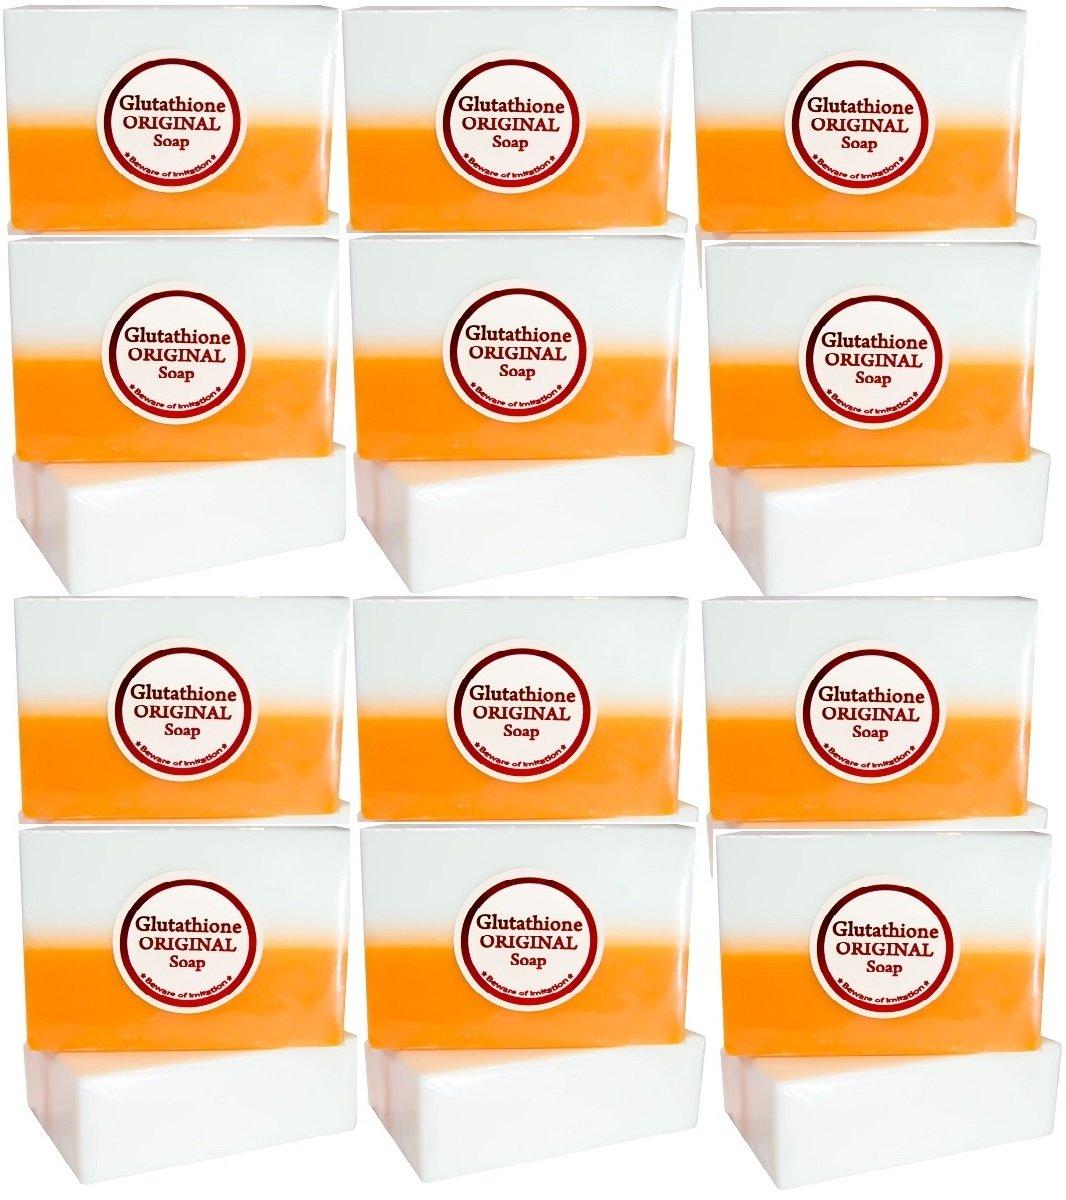 Kojic Acid & Glutathione Dual Whitening/bleaching Soap (12 Soaps)